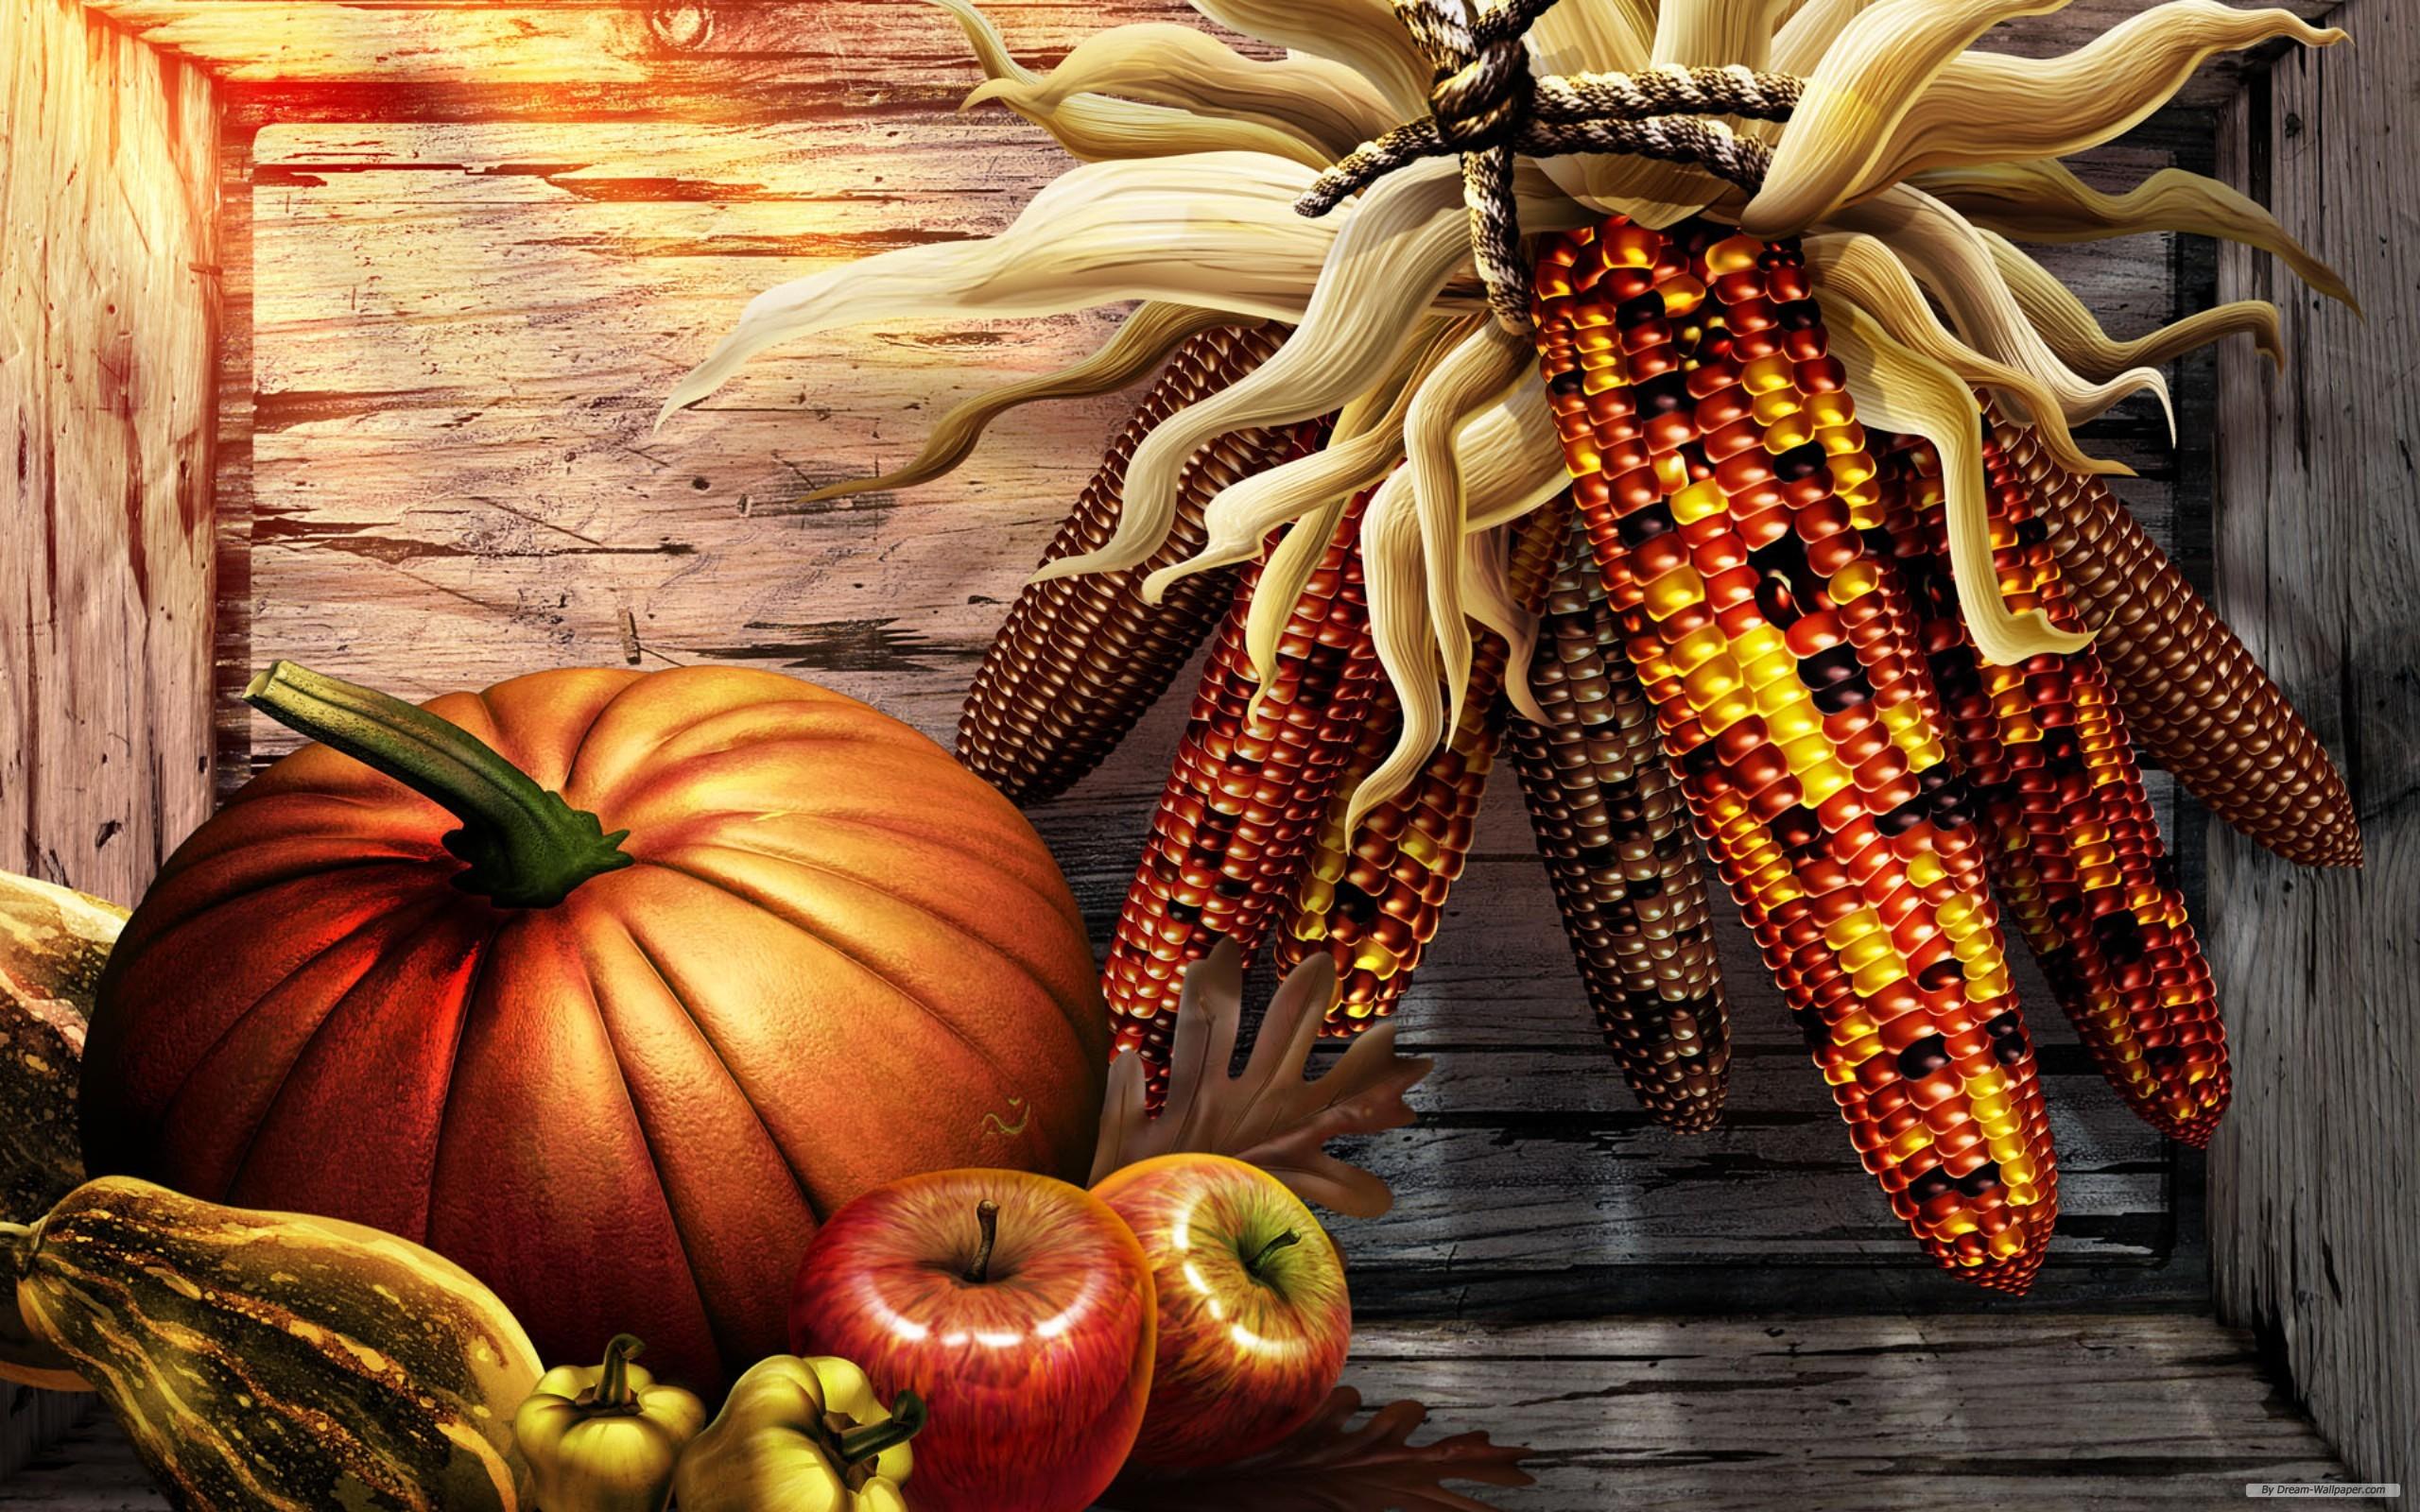 Wallpaper   Holiday wallpaper   Thanksgiving Day wallpaper 2560x1600